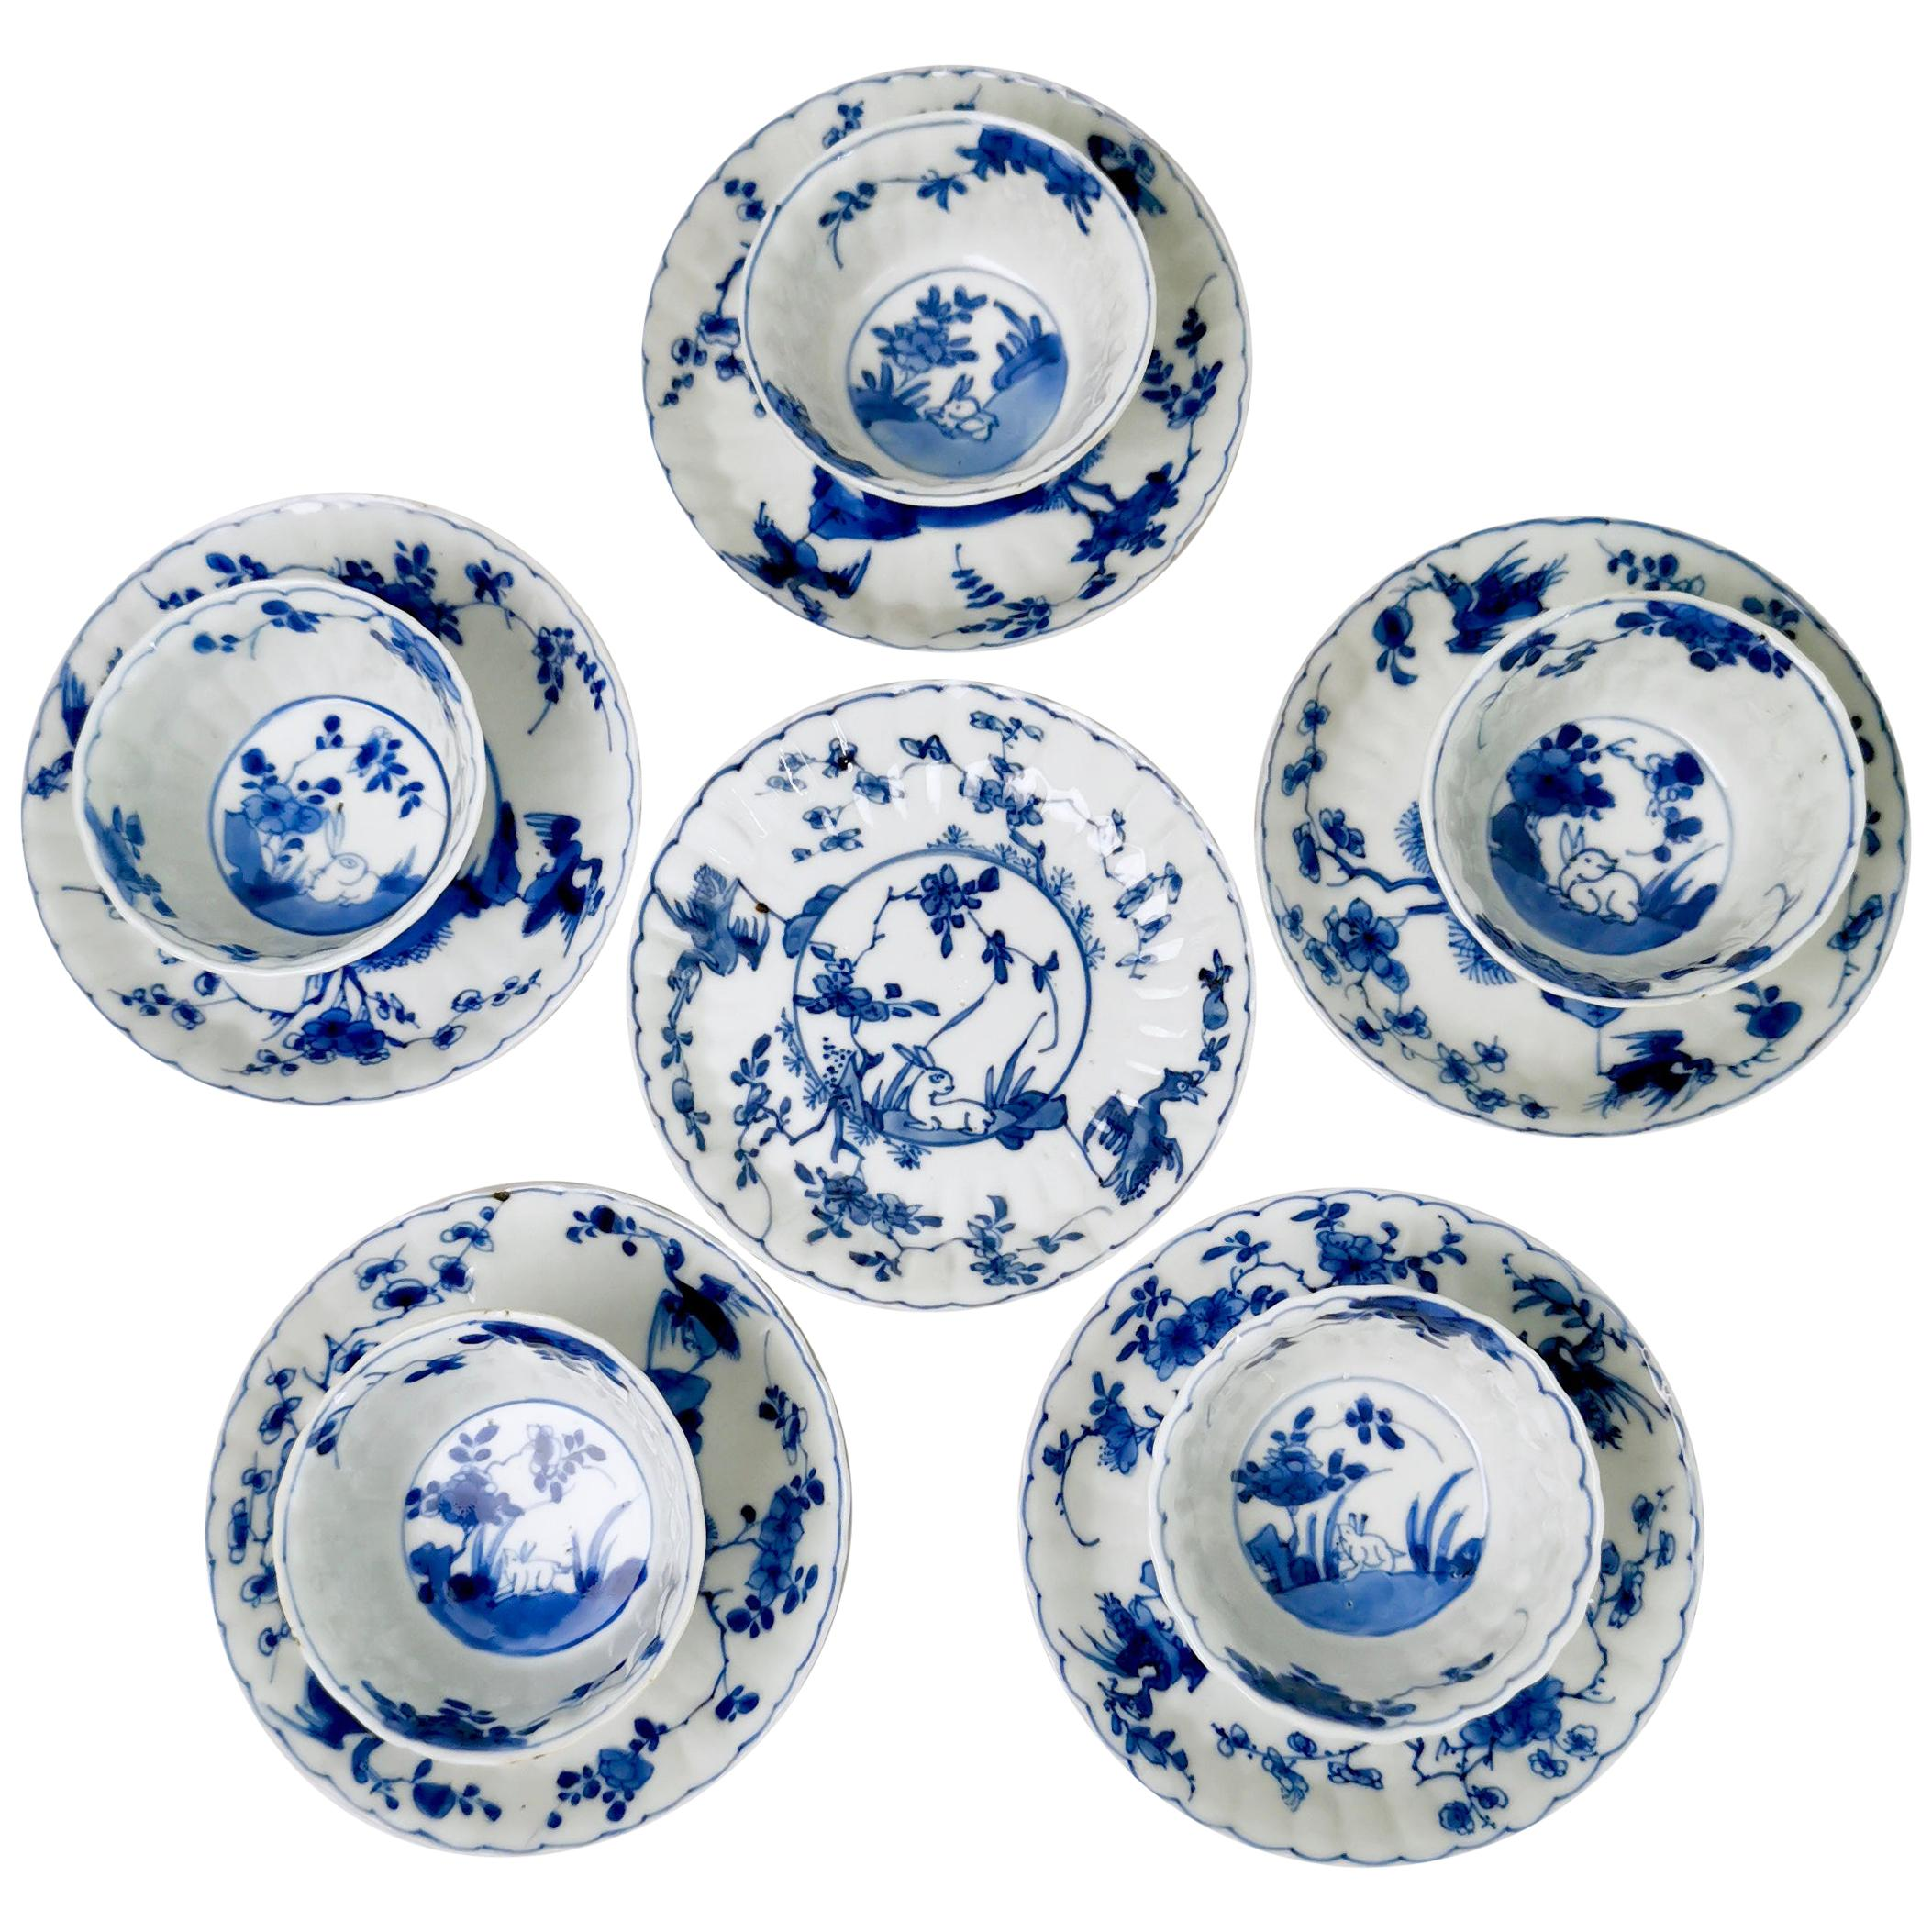 Ceramic Dinner Plates - 1,393 For Sale at 1stdibs